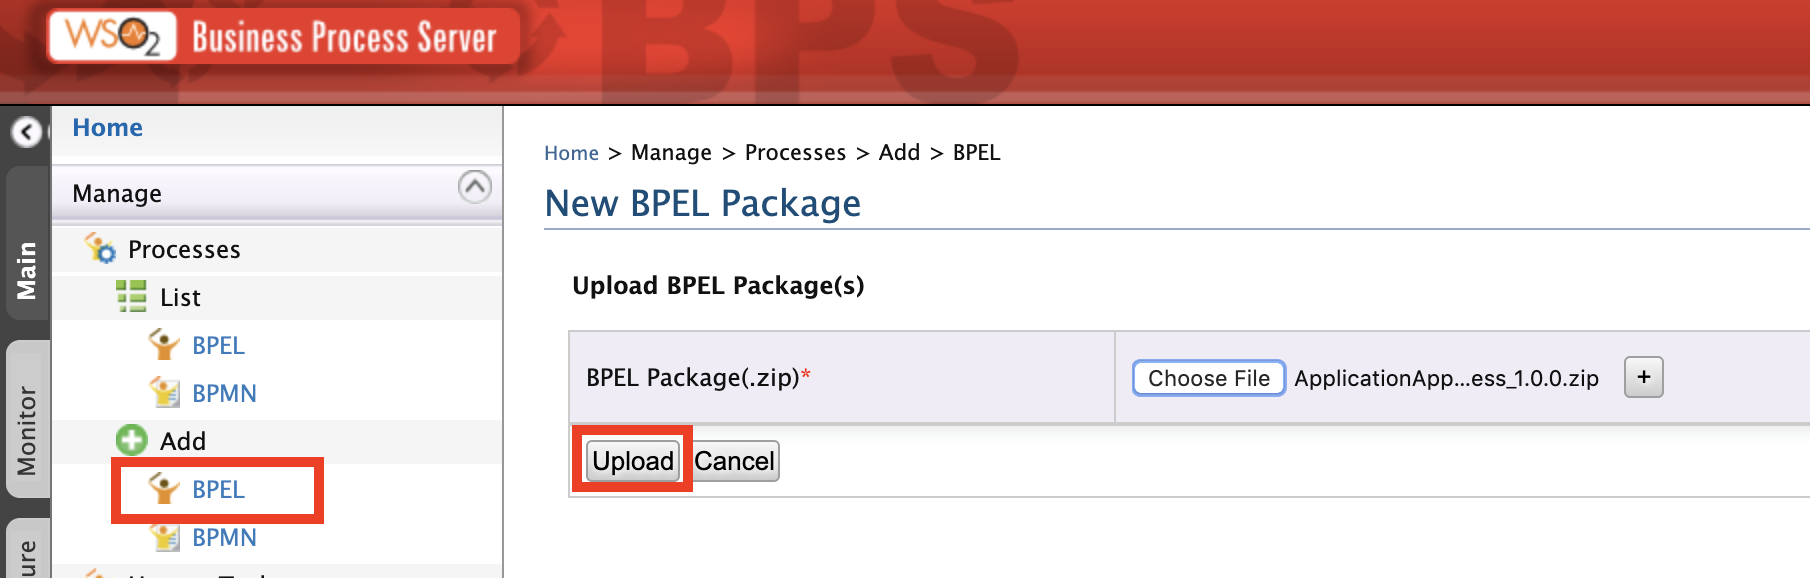 Upload BPEL archive file